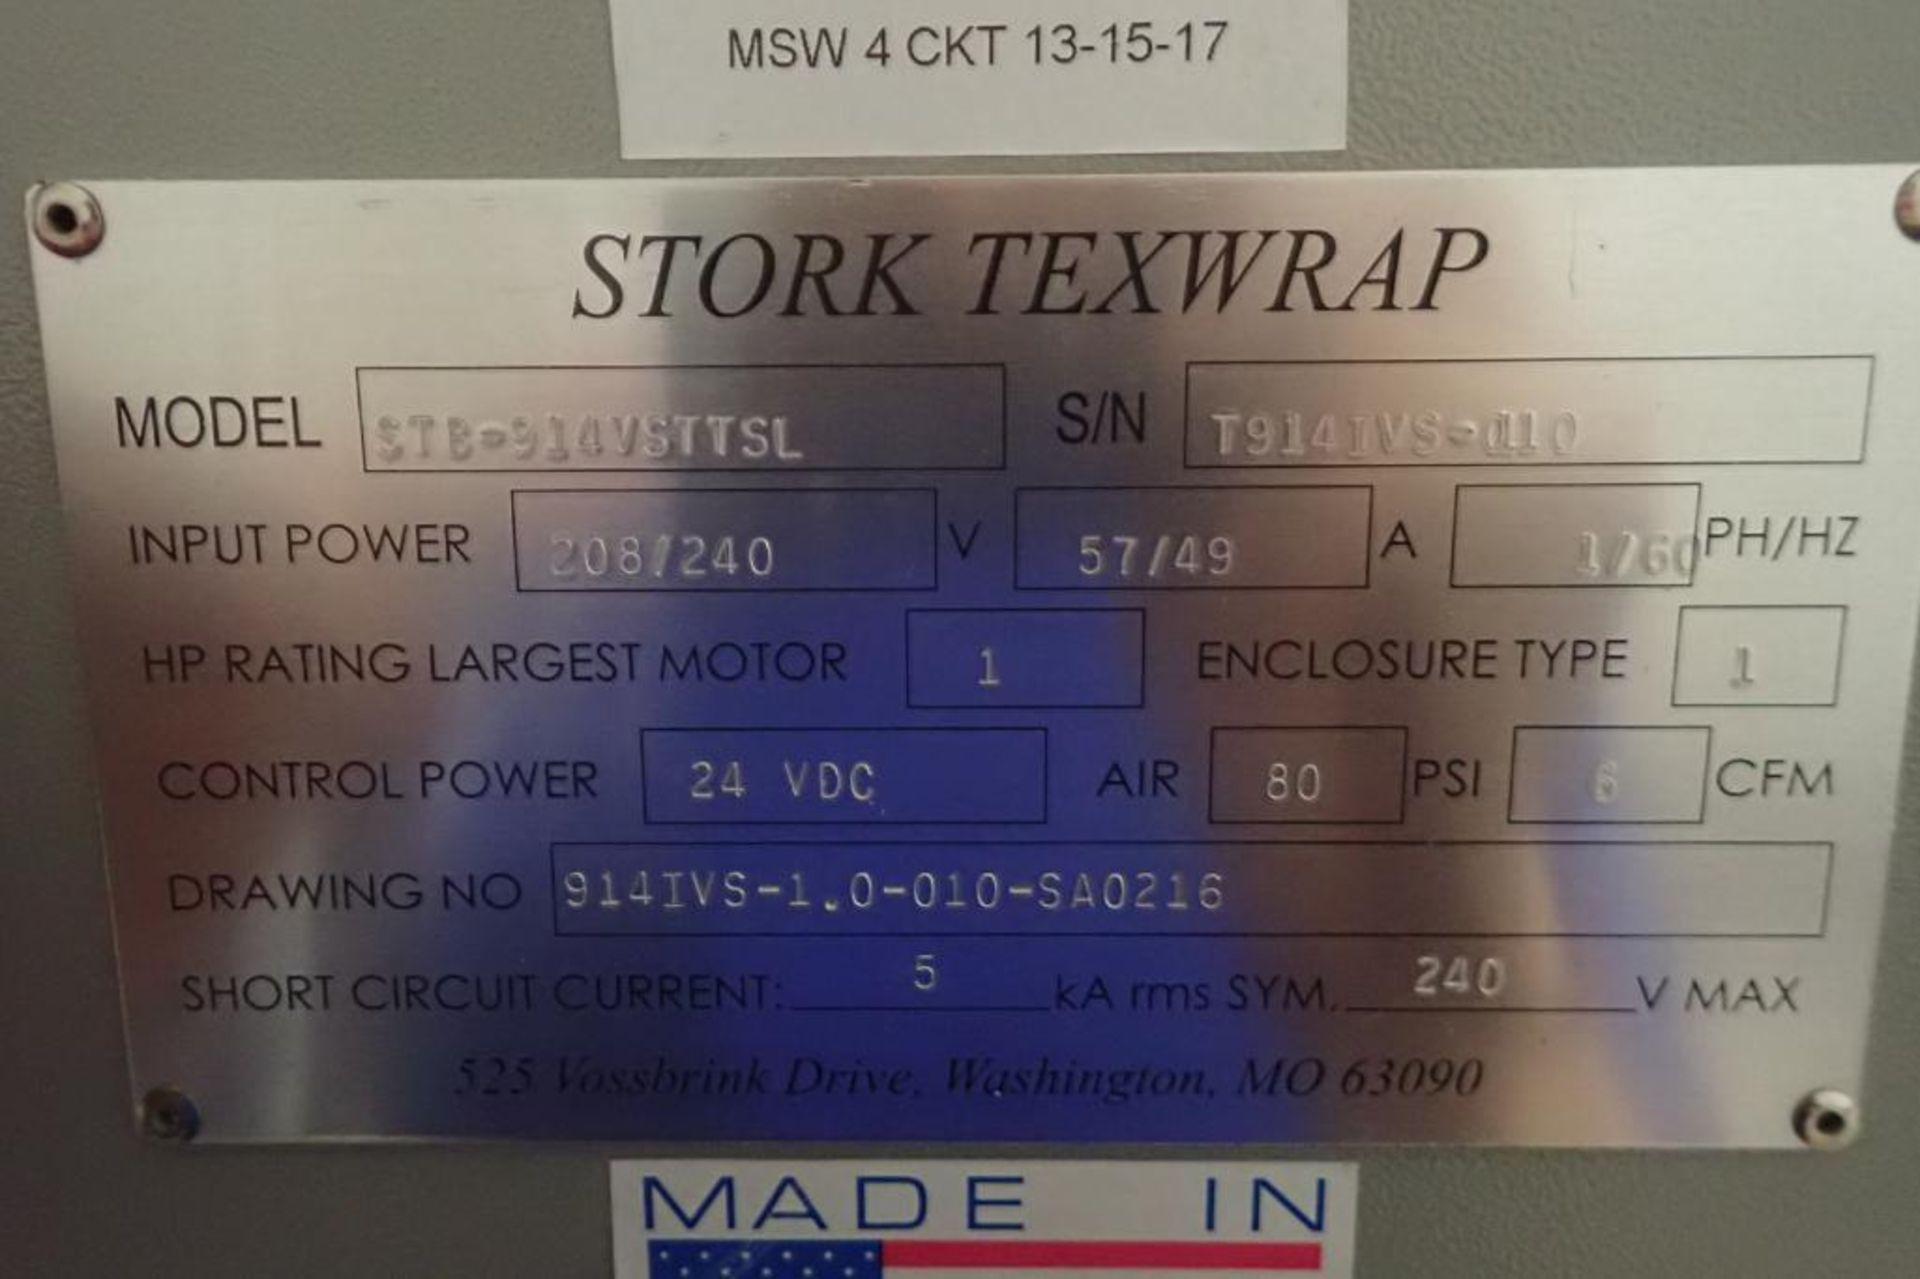 Lot 28 - Stork texwrap TTS-TVS over-wrapper, Model STB-914VSTTSL, T914IVS-010, 16 in. tall vertical seal